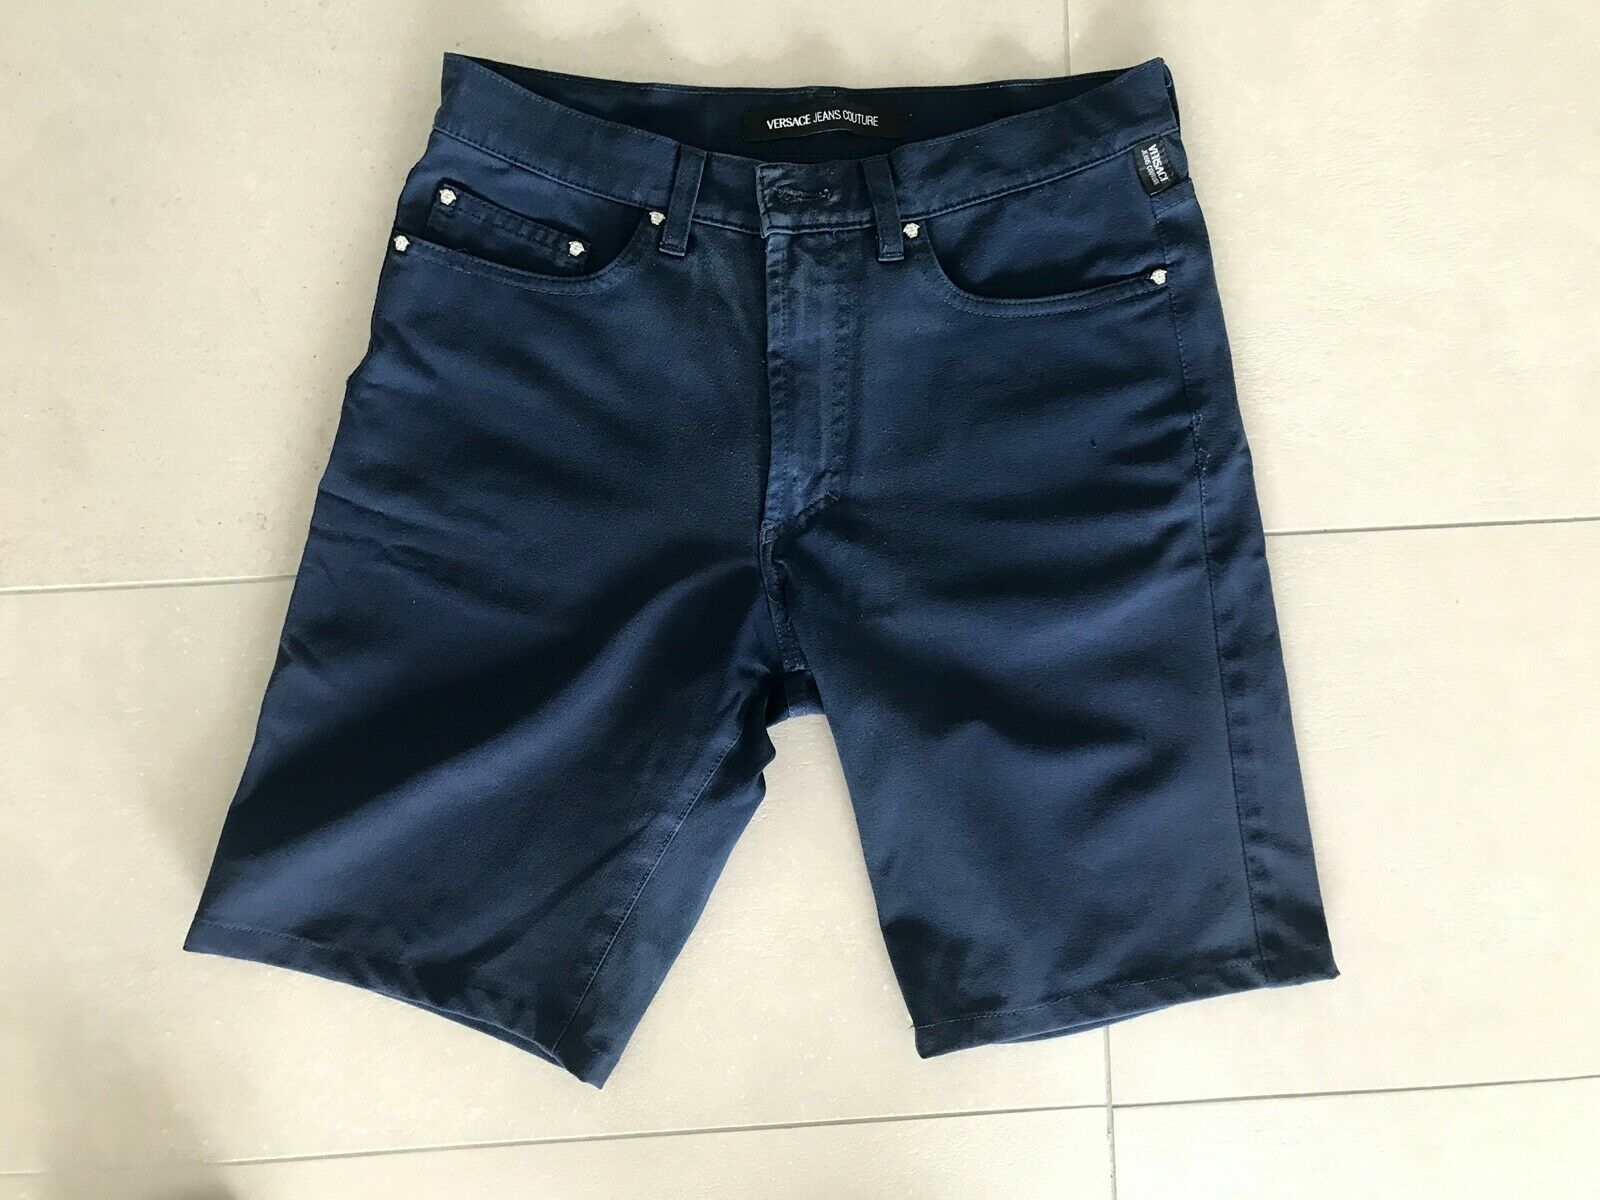 ! top! versace shorts chino azul corto de lujo tamaño 31! top!